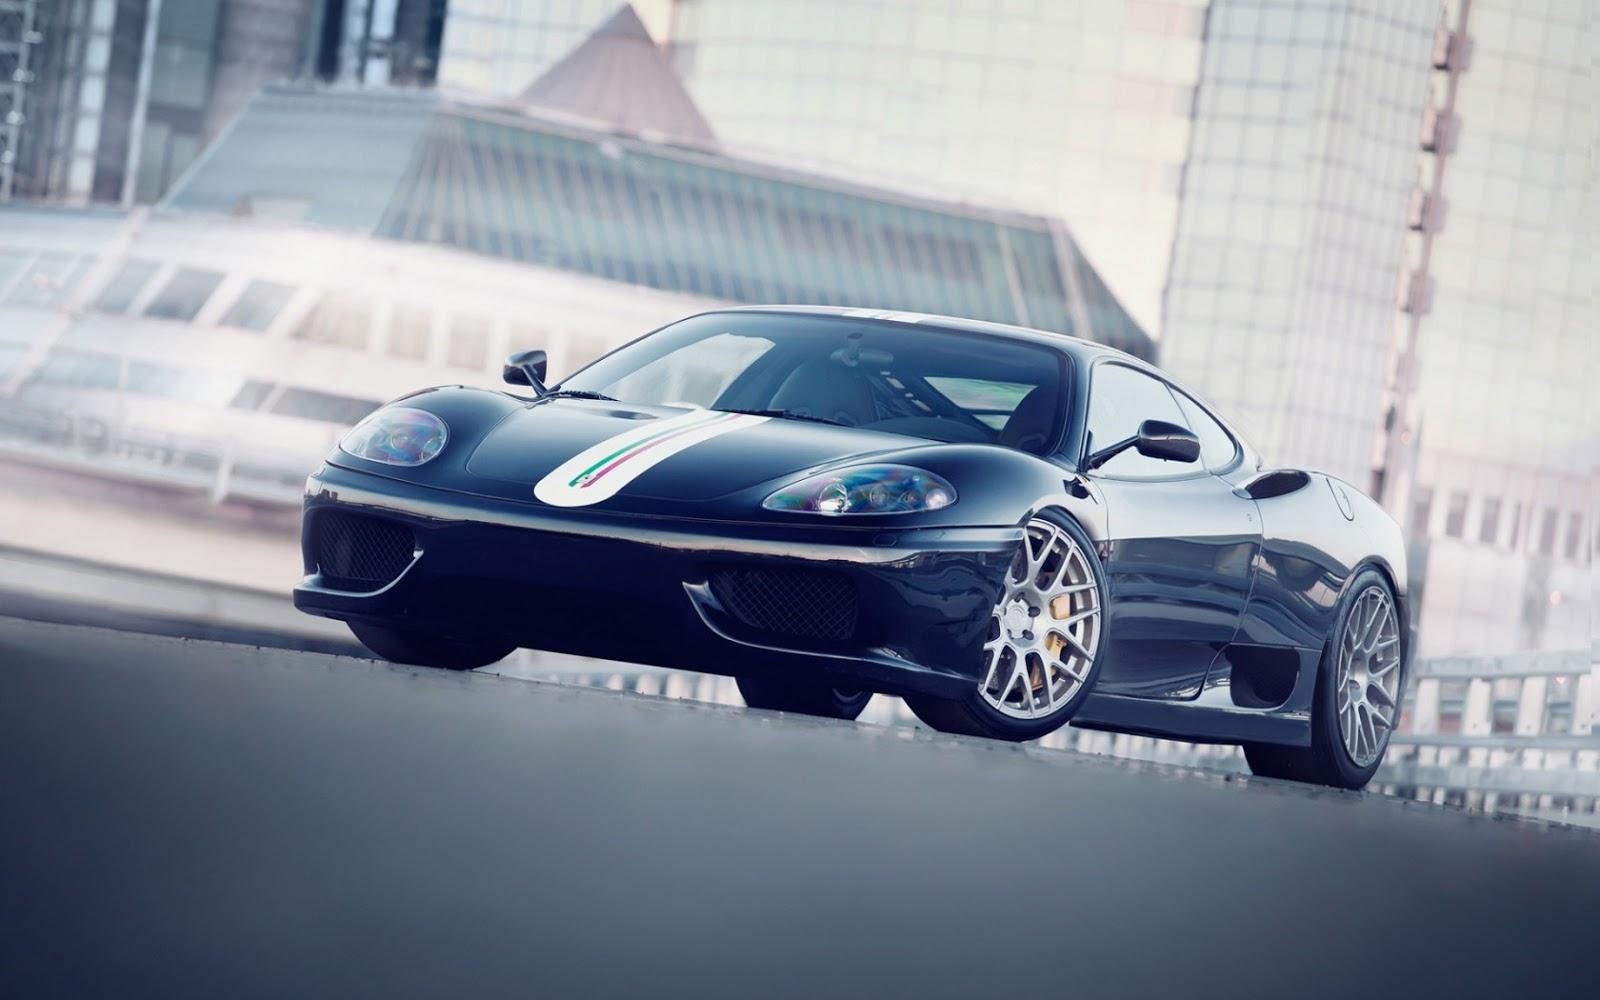 Ferrari%2B360%2BChallenge%2BStradale1 10 λόγοι που η Ferrari 360 Challenge Stradale ανήκει στο γκαράζ των ονείρων μας Ferrari, Ferrari 360 Challenge Stradale, Ferrari 360 Modena, Ferrari Challenge Stradale, videos